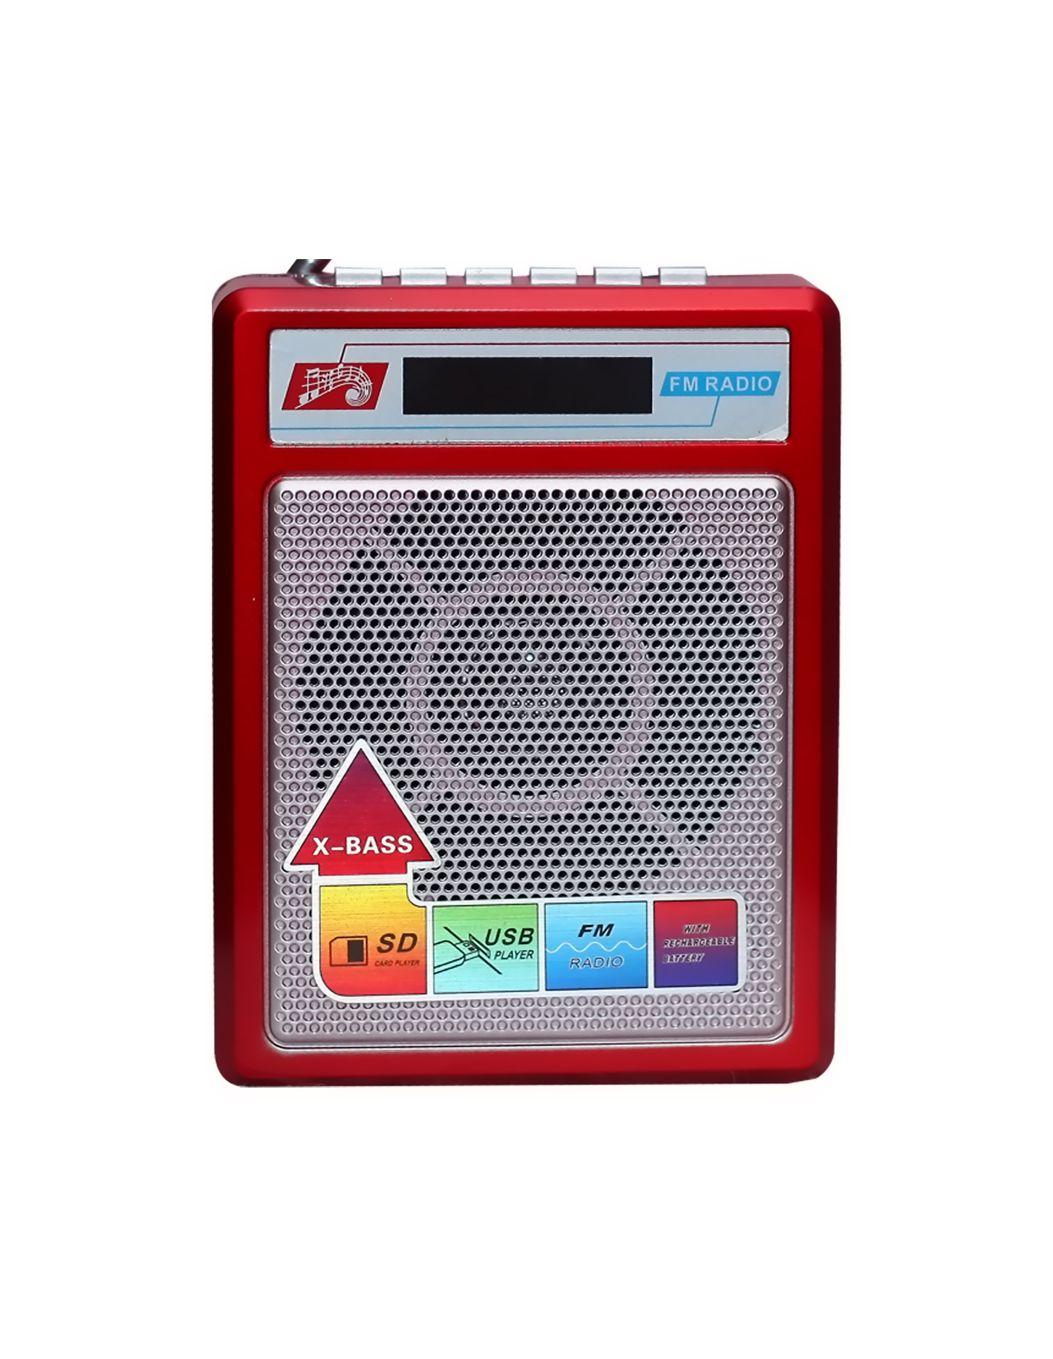 Sonilex Portable Multimedia Fm Radio Usb sd Player 414   Red